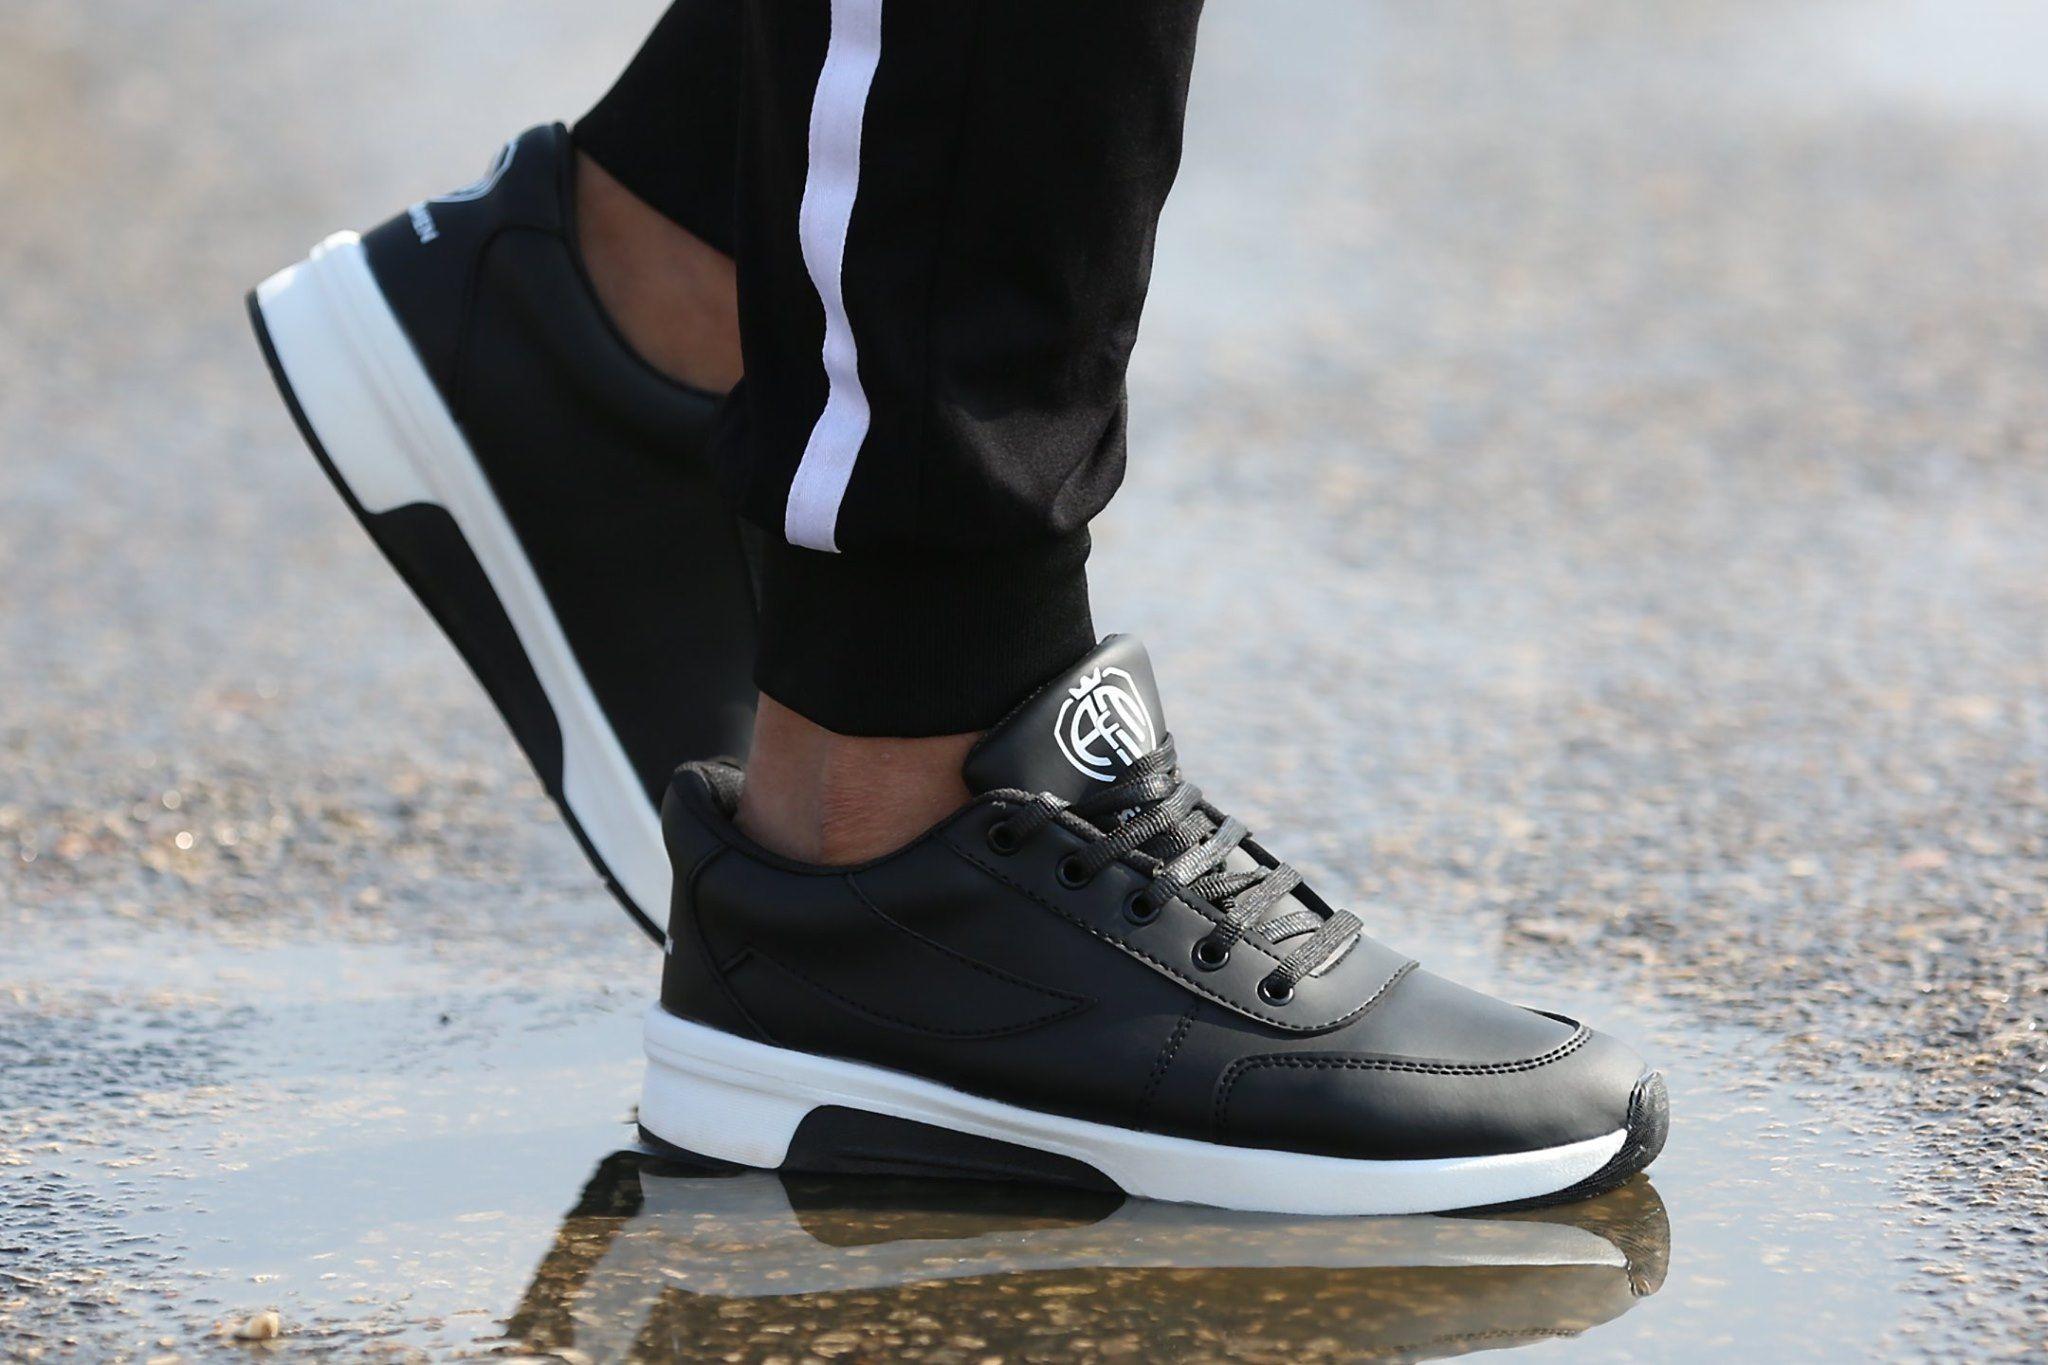 حذاء Amformen اوريجنال اصلي بمميزات الـ1x10 Shoe Brands Air Max Sneakers Nike Air Max